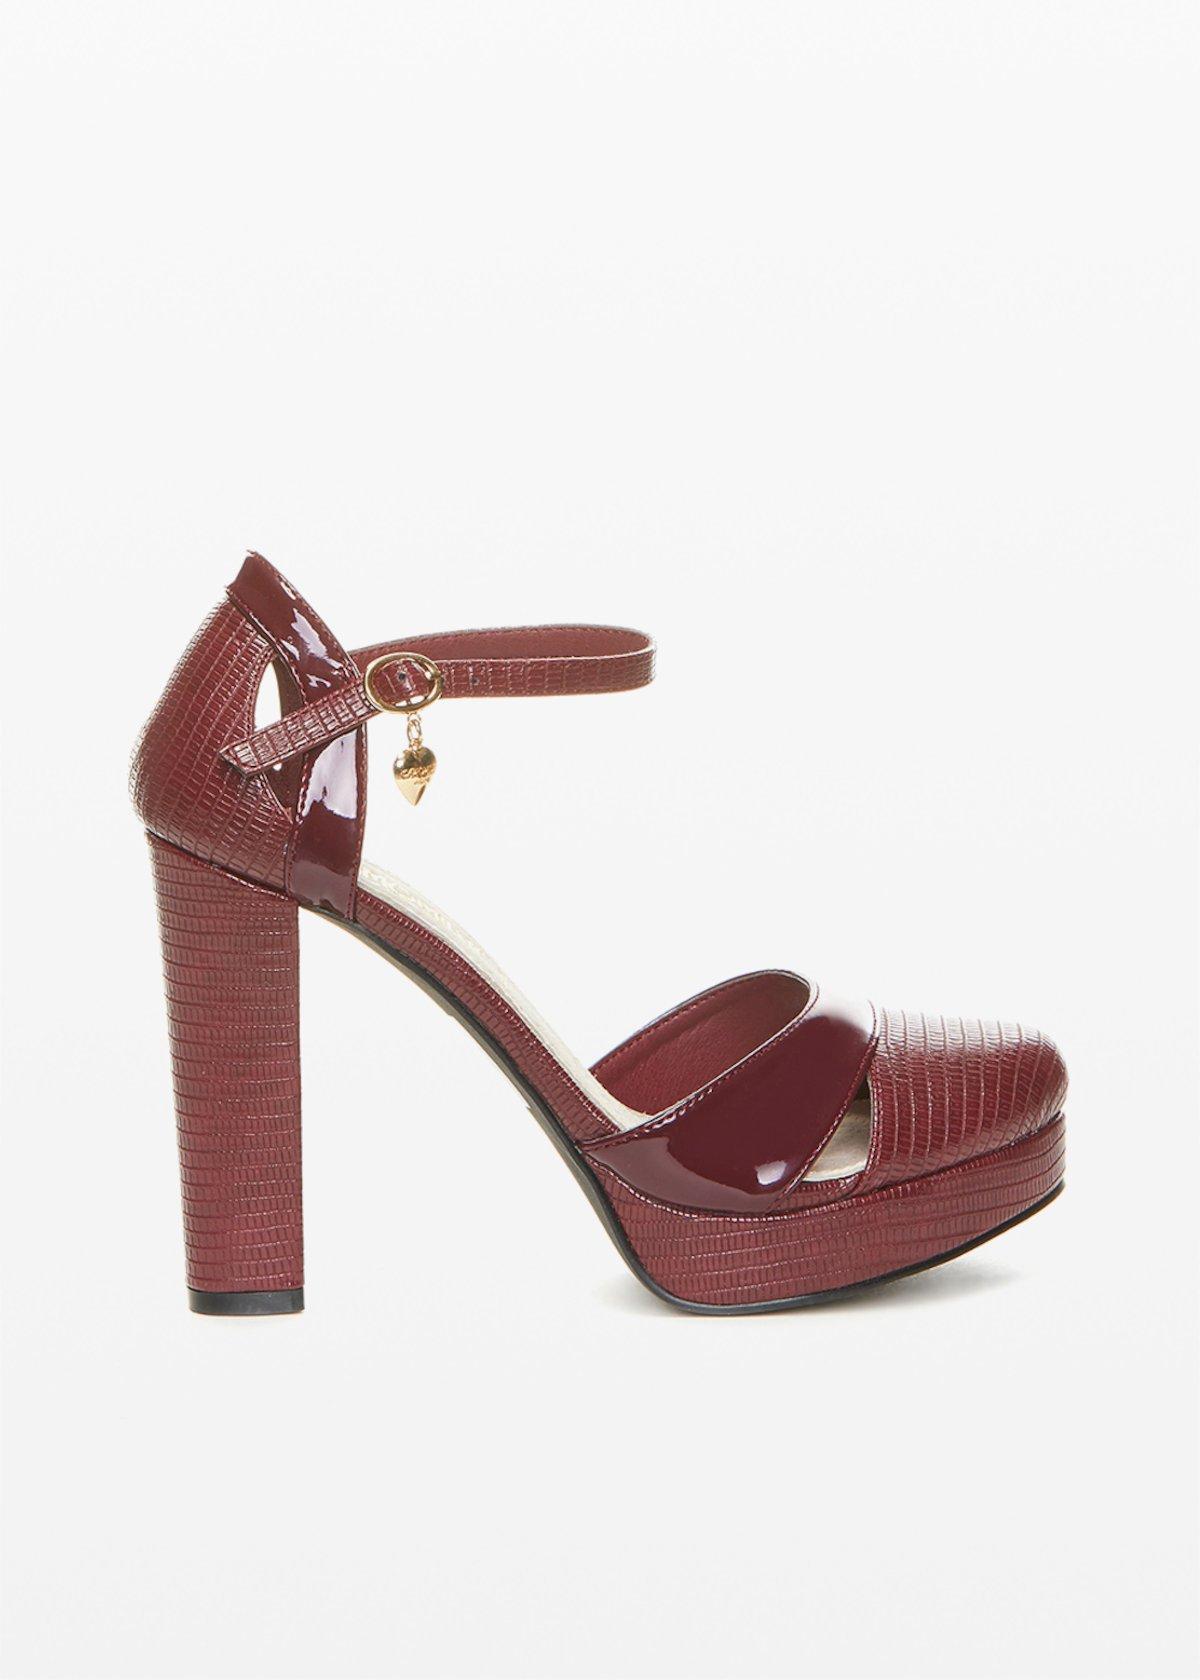 Patent Sophie sandal python effect - Morello - Woman